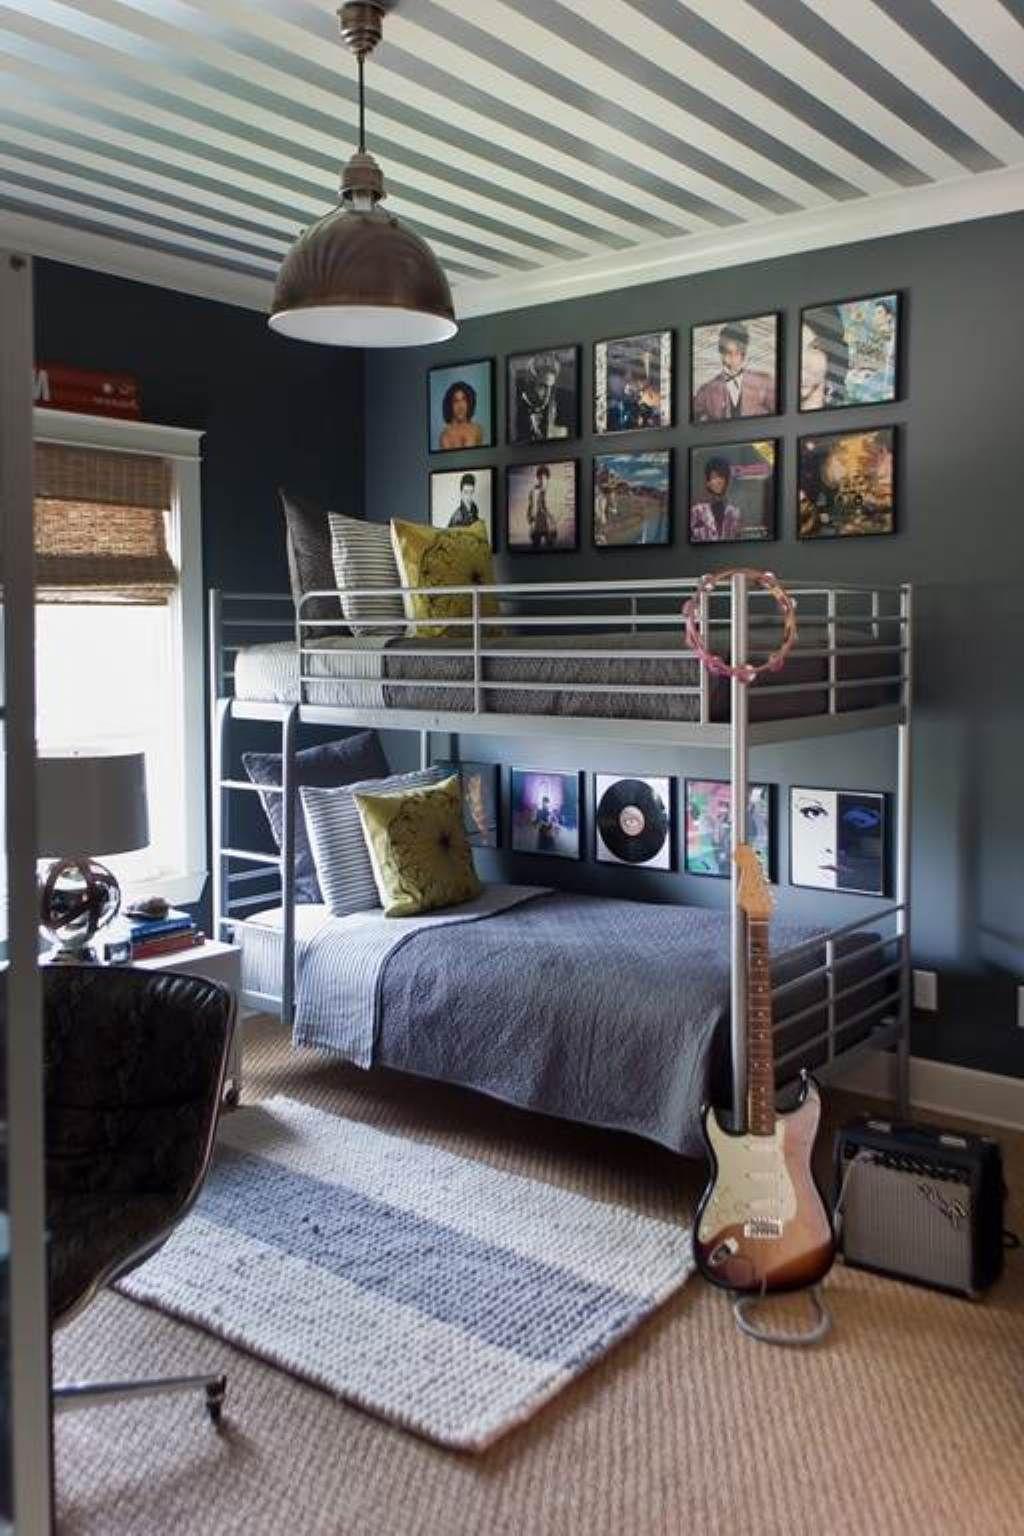 25 Marvelous Kids Rooms Ceiling Designs Ideas Raising Your Kids Properly Is The Most Essential Part Of Boy Bedroom Design Tween Boy Bedroom Music Bedroom Youth bedroom design ideas